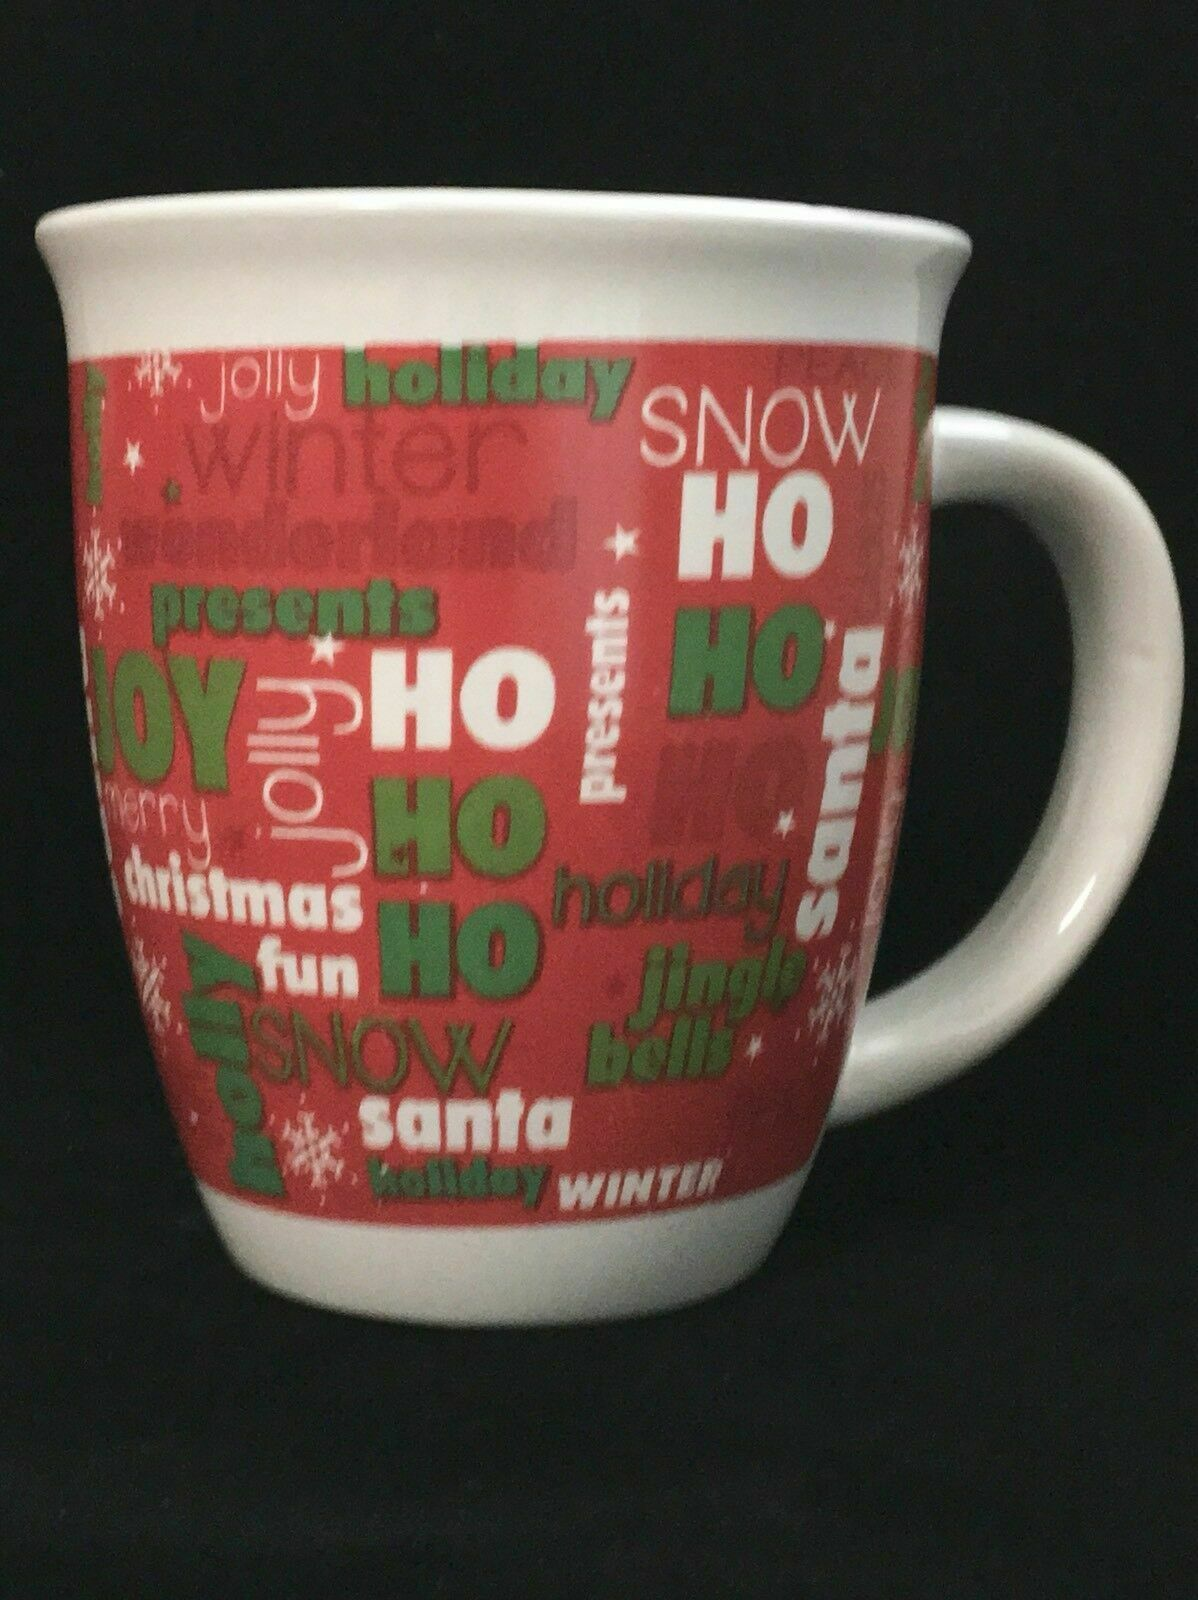 Royal Norfolk Tis Season To Be Jolly Christmas Holiday Coffee Mug Holly For Sale Online Ebay